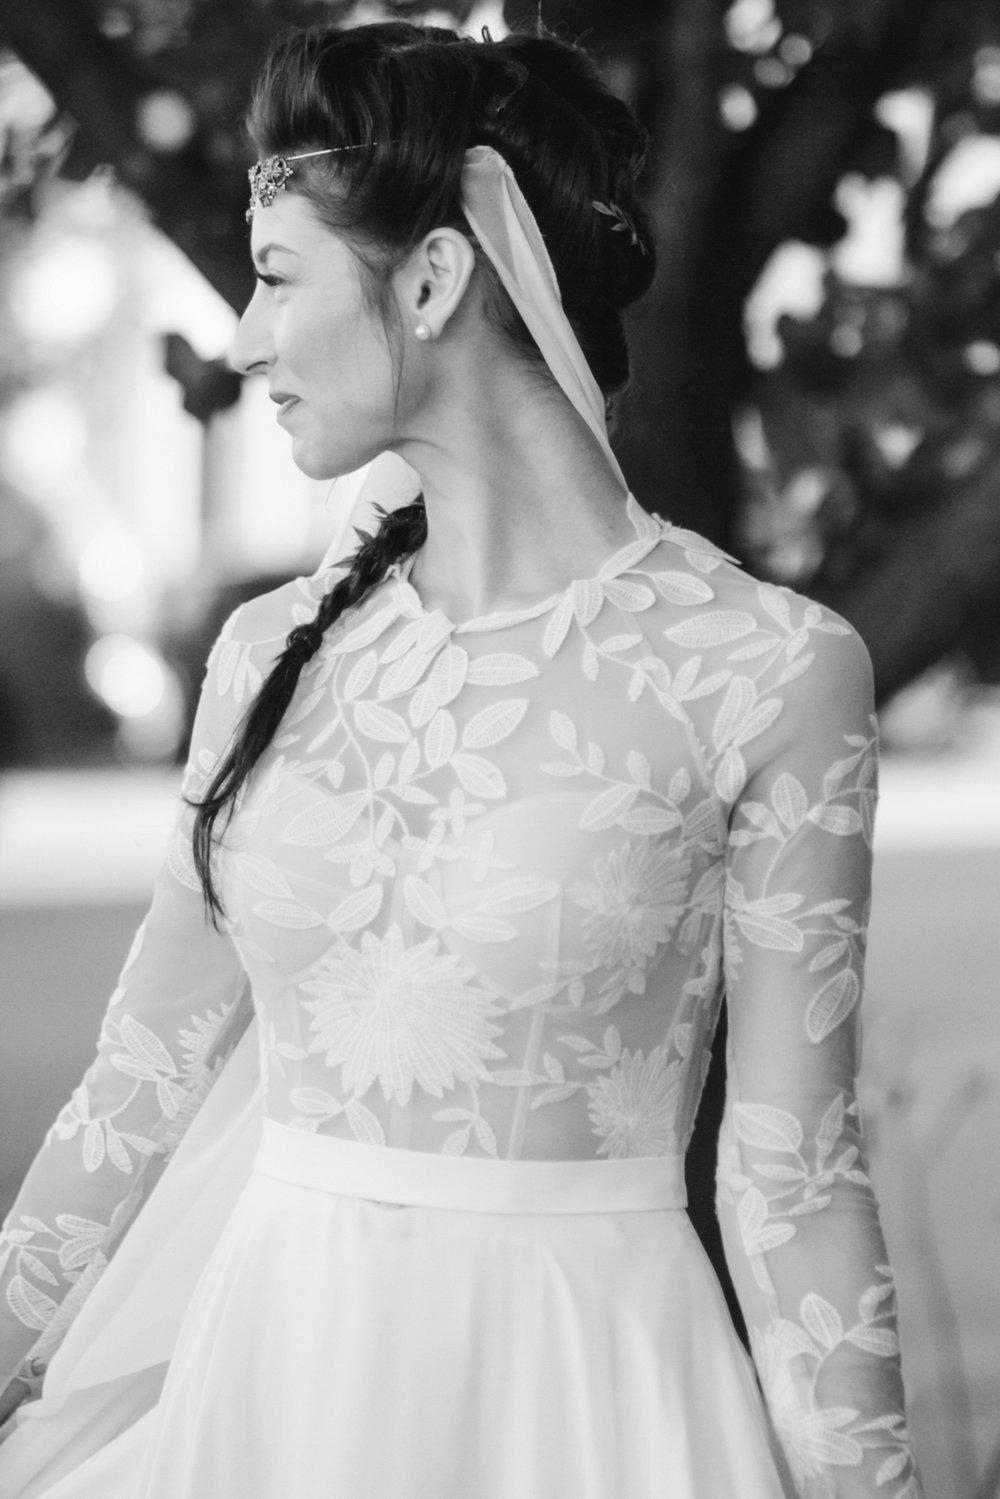 Kimberly-Coccagnia-Wedding-Photographer-148.JPG